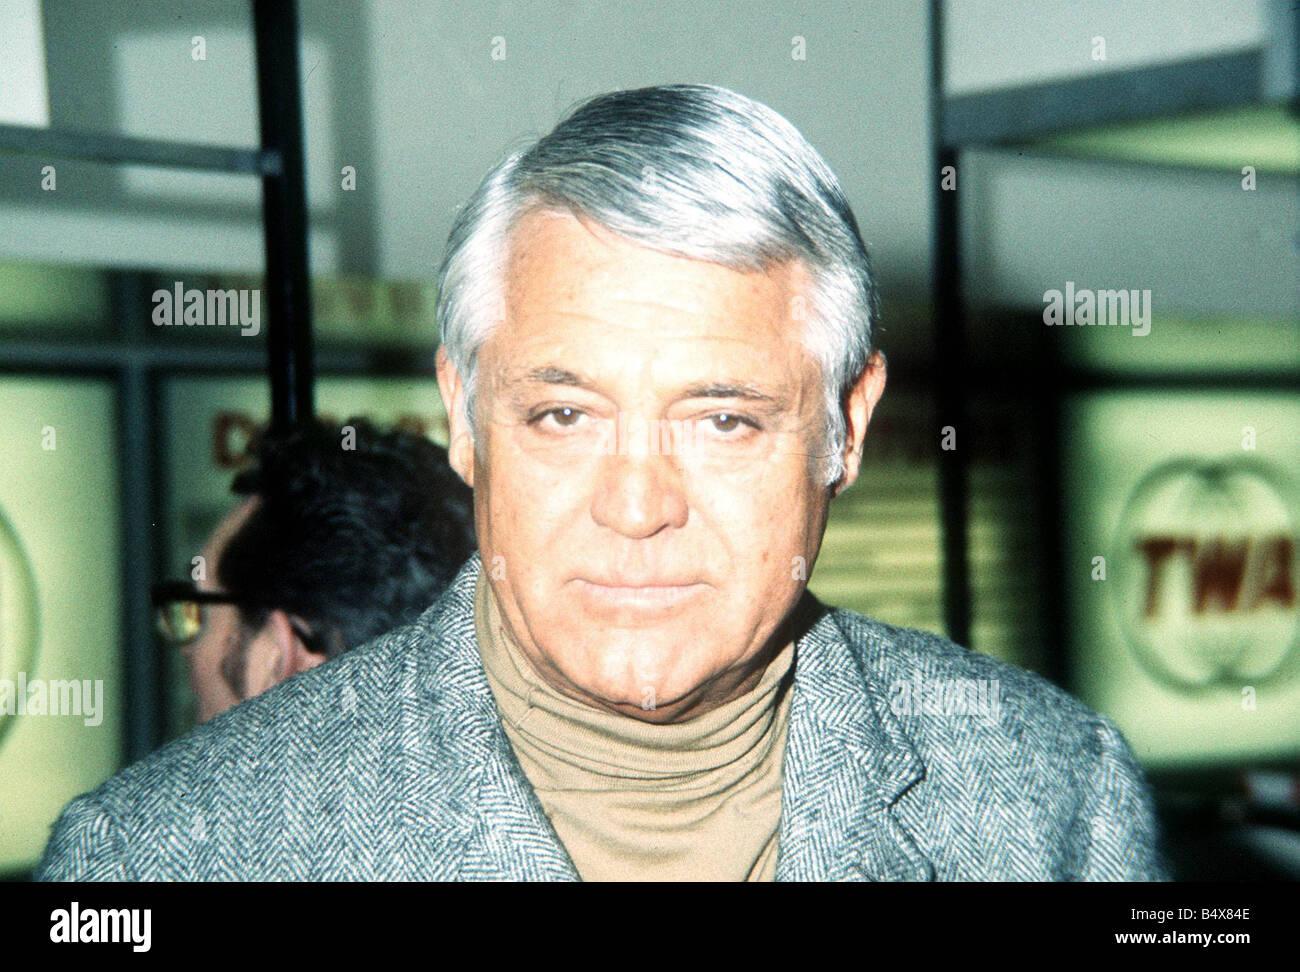 Cary Grant Schauspieler Rollkragen grau Jacke Stockbild